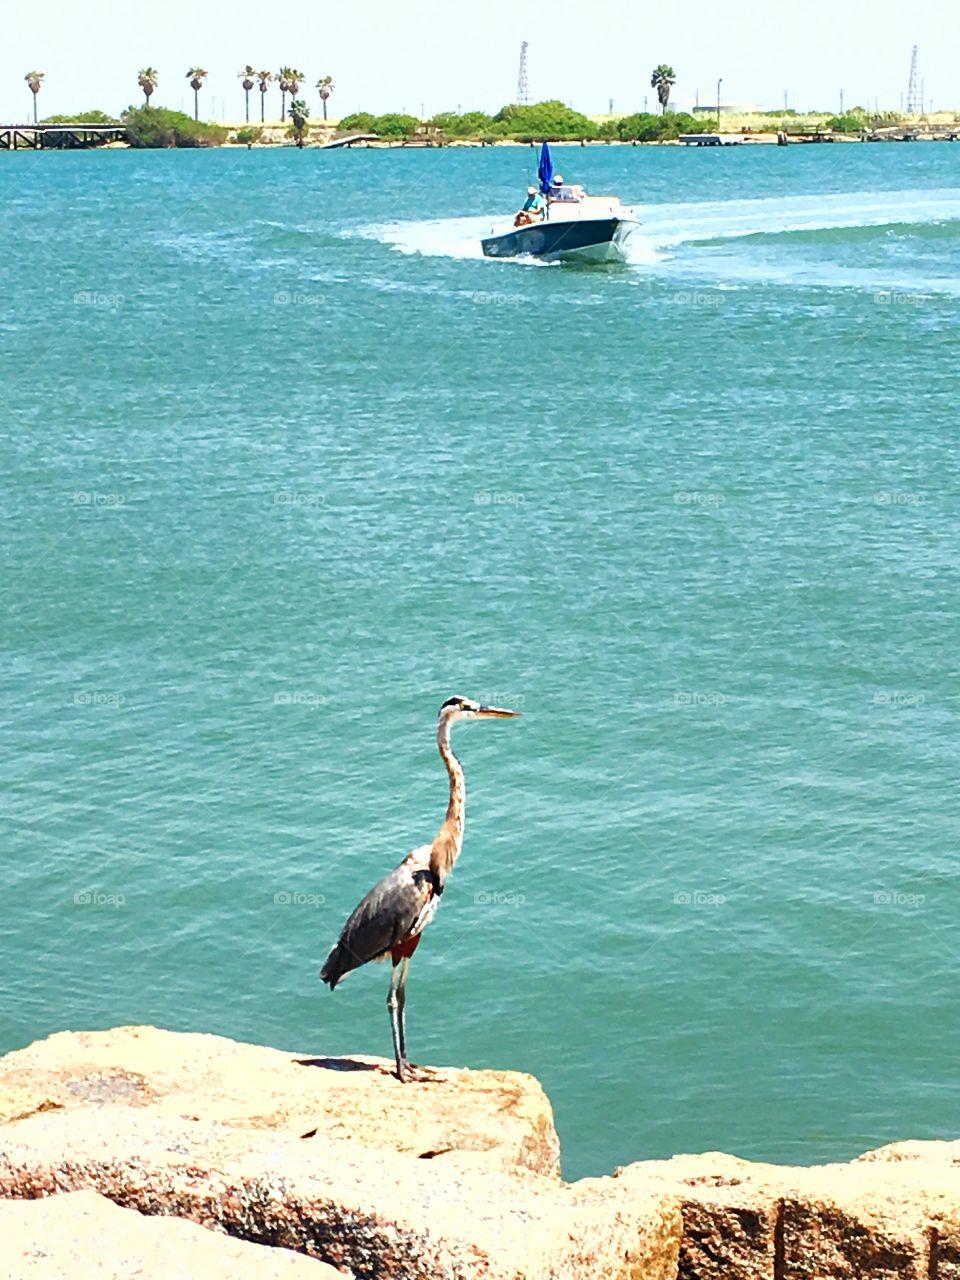 Crane on jetty in Port Aransas, Texas.